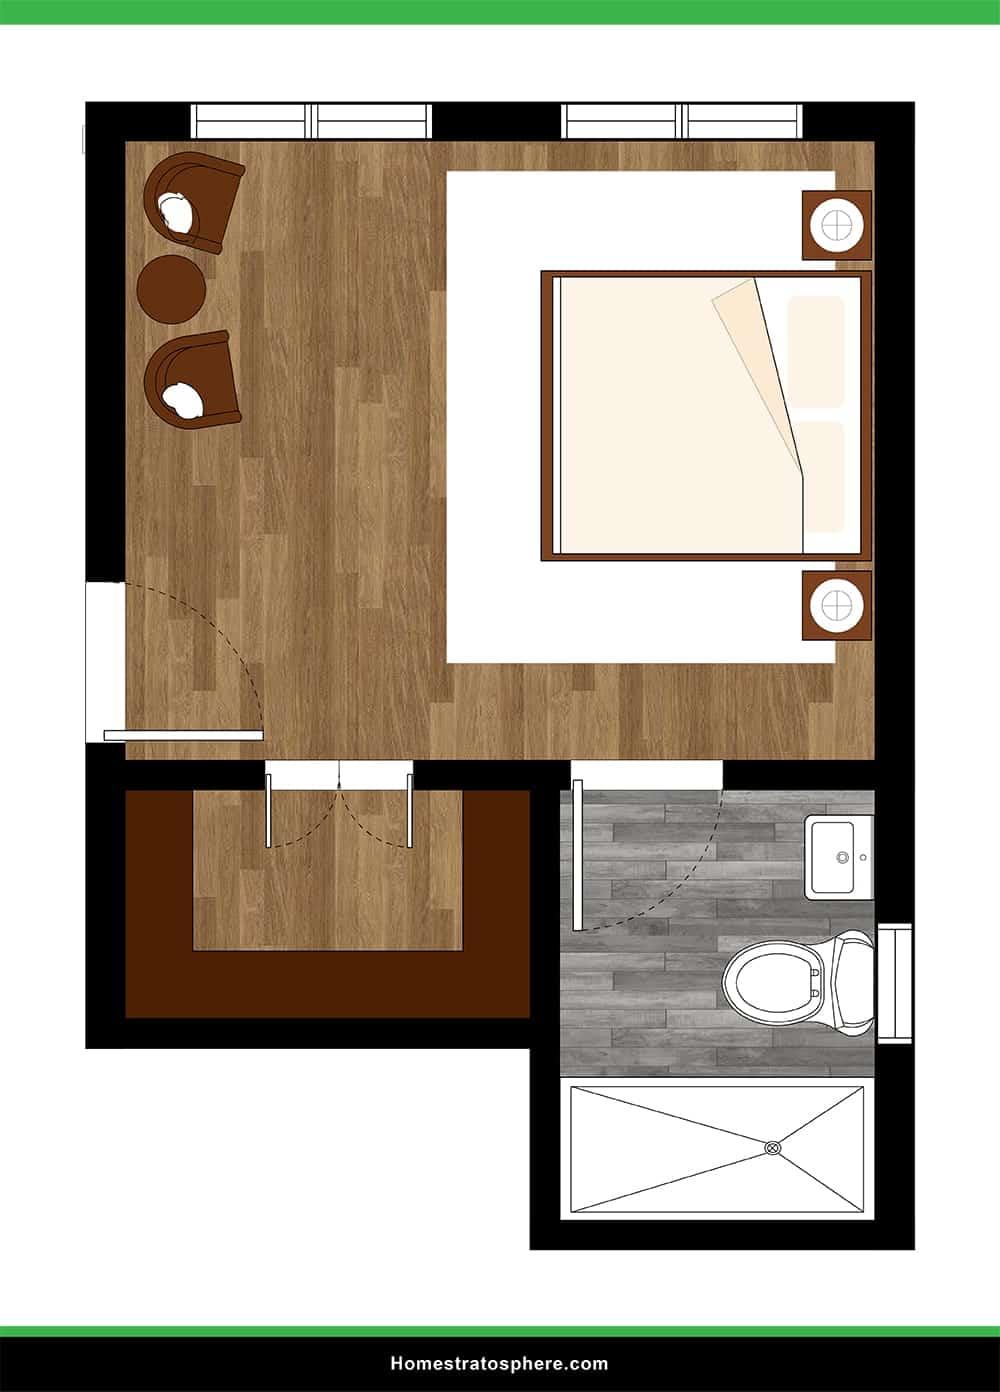 Functional Yet Reasonable Primary Bedroom with Sitting Area